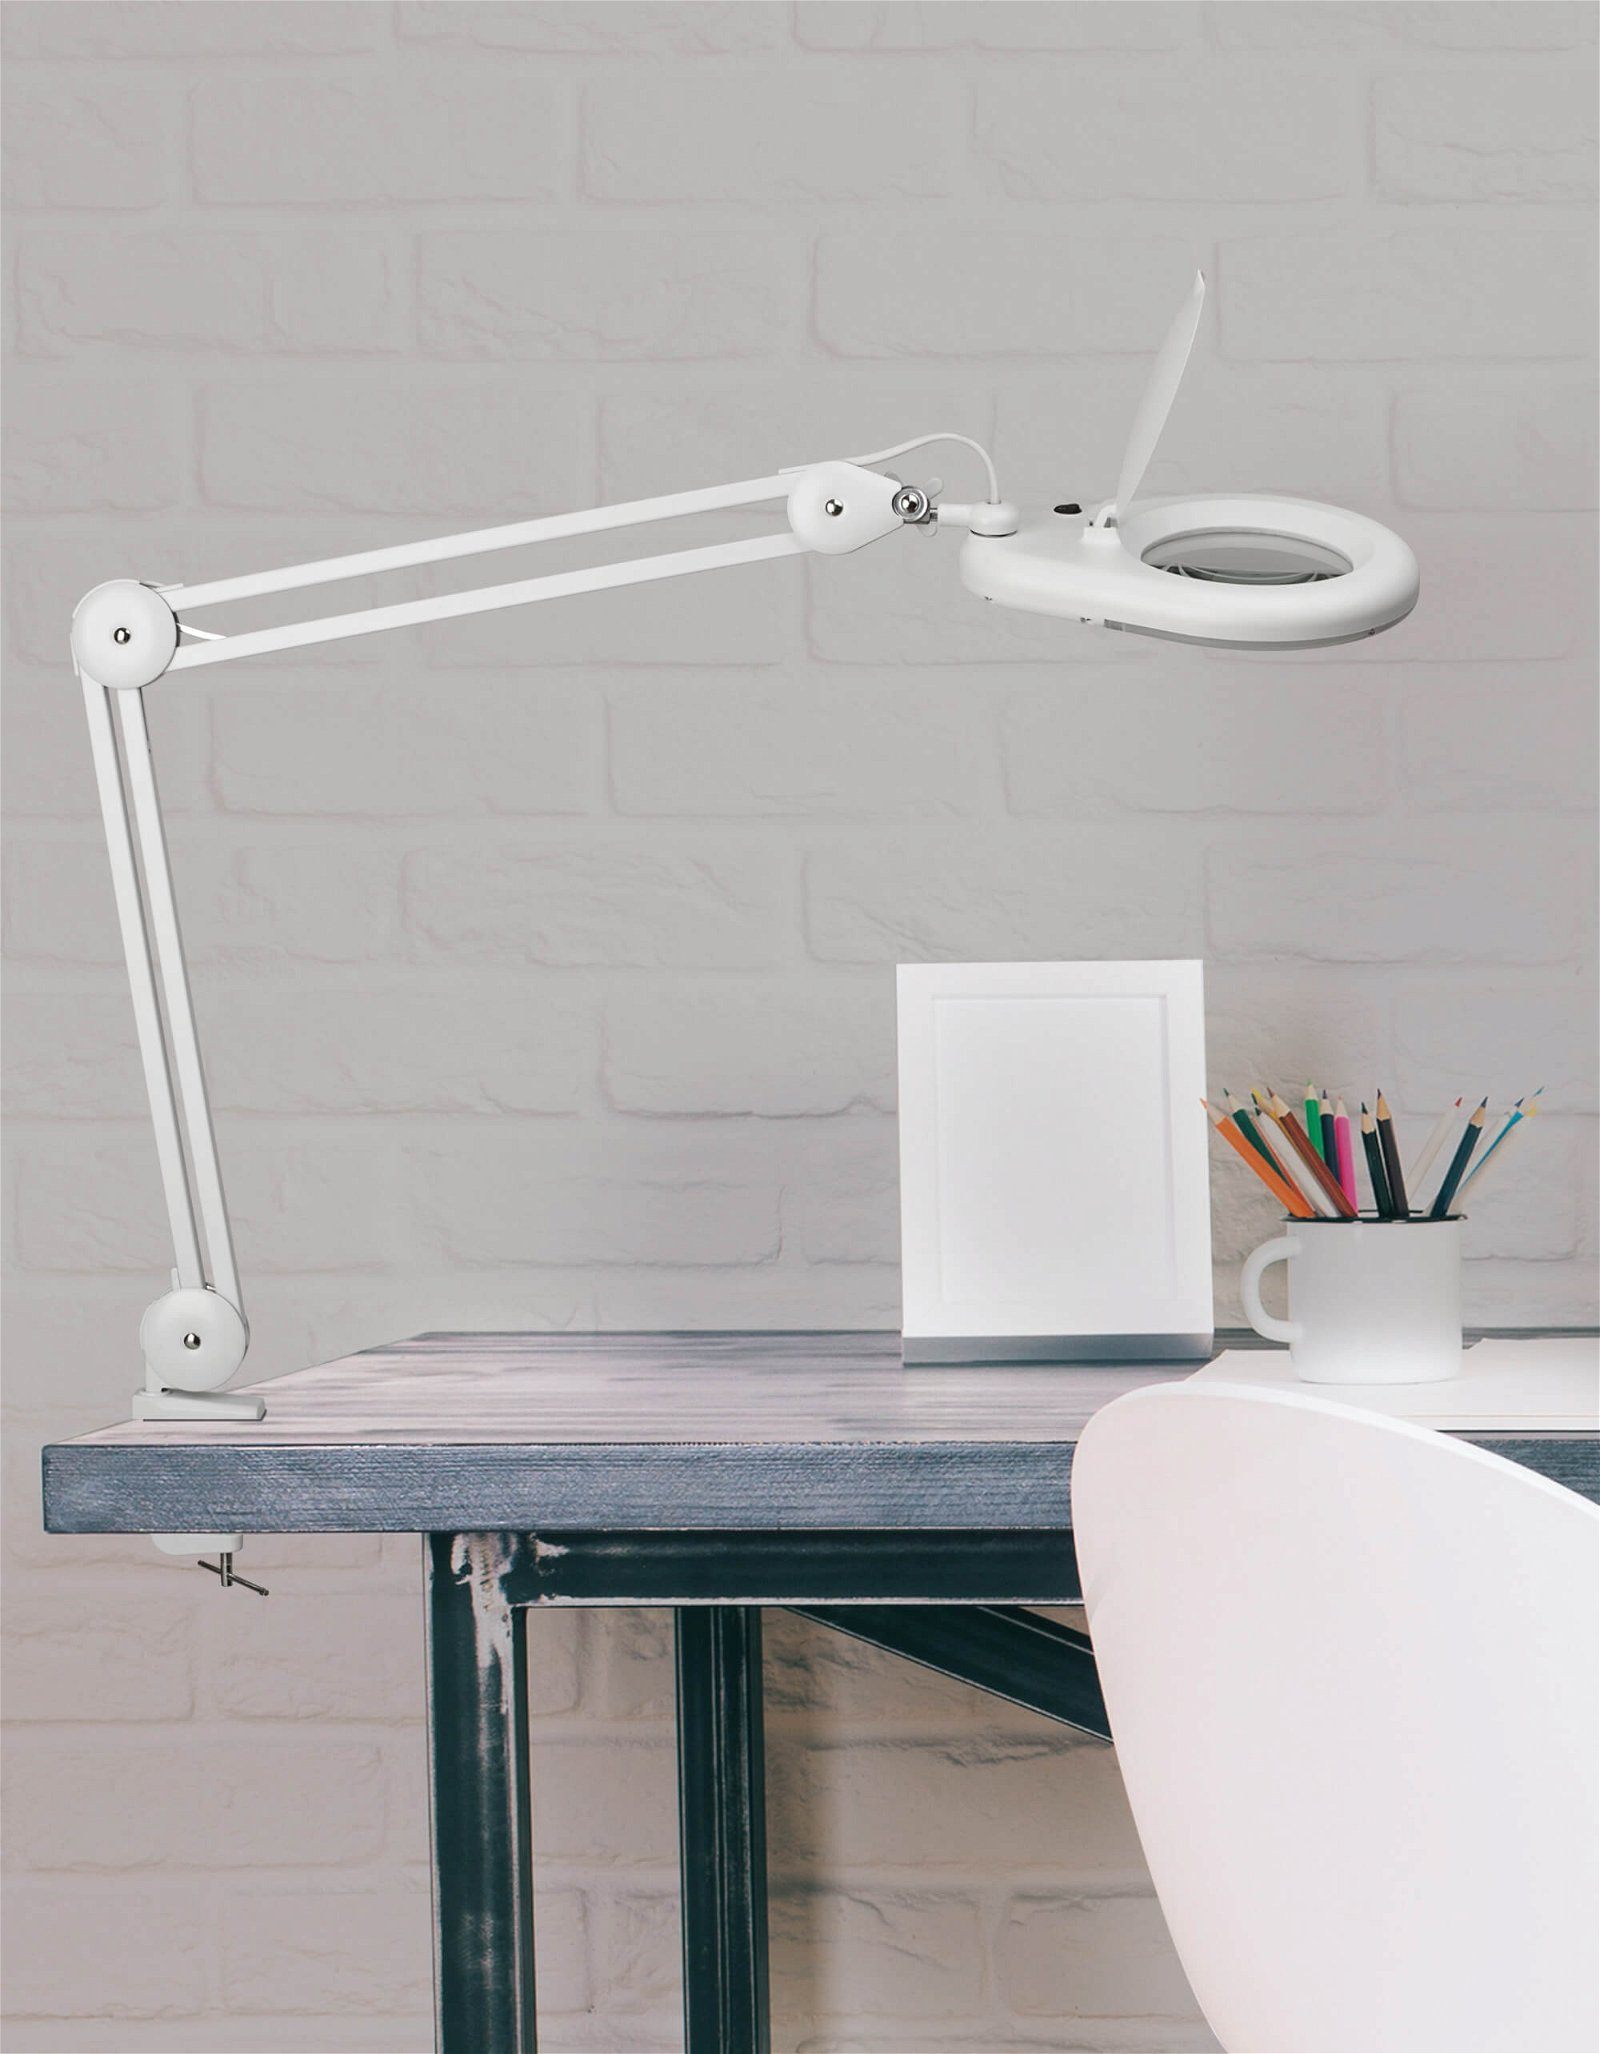 LED-Lupenleuchte MAULviso, mit Klemmfuß, weiß